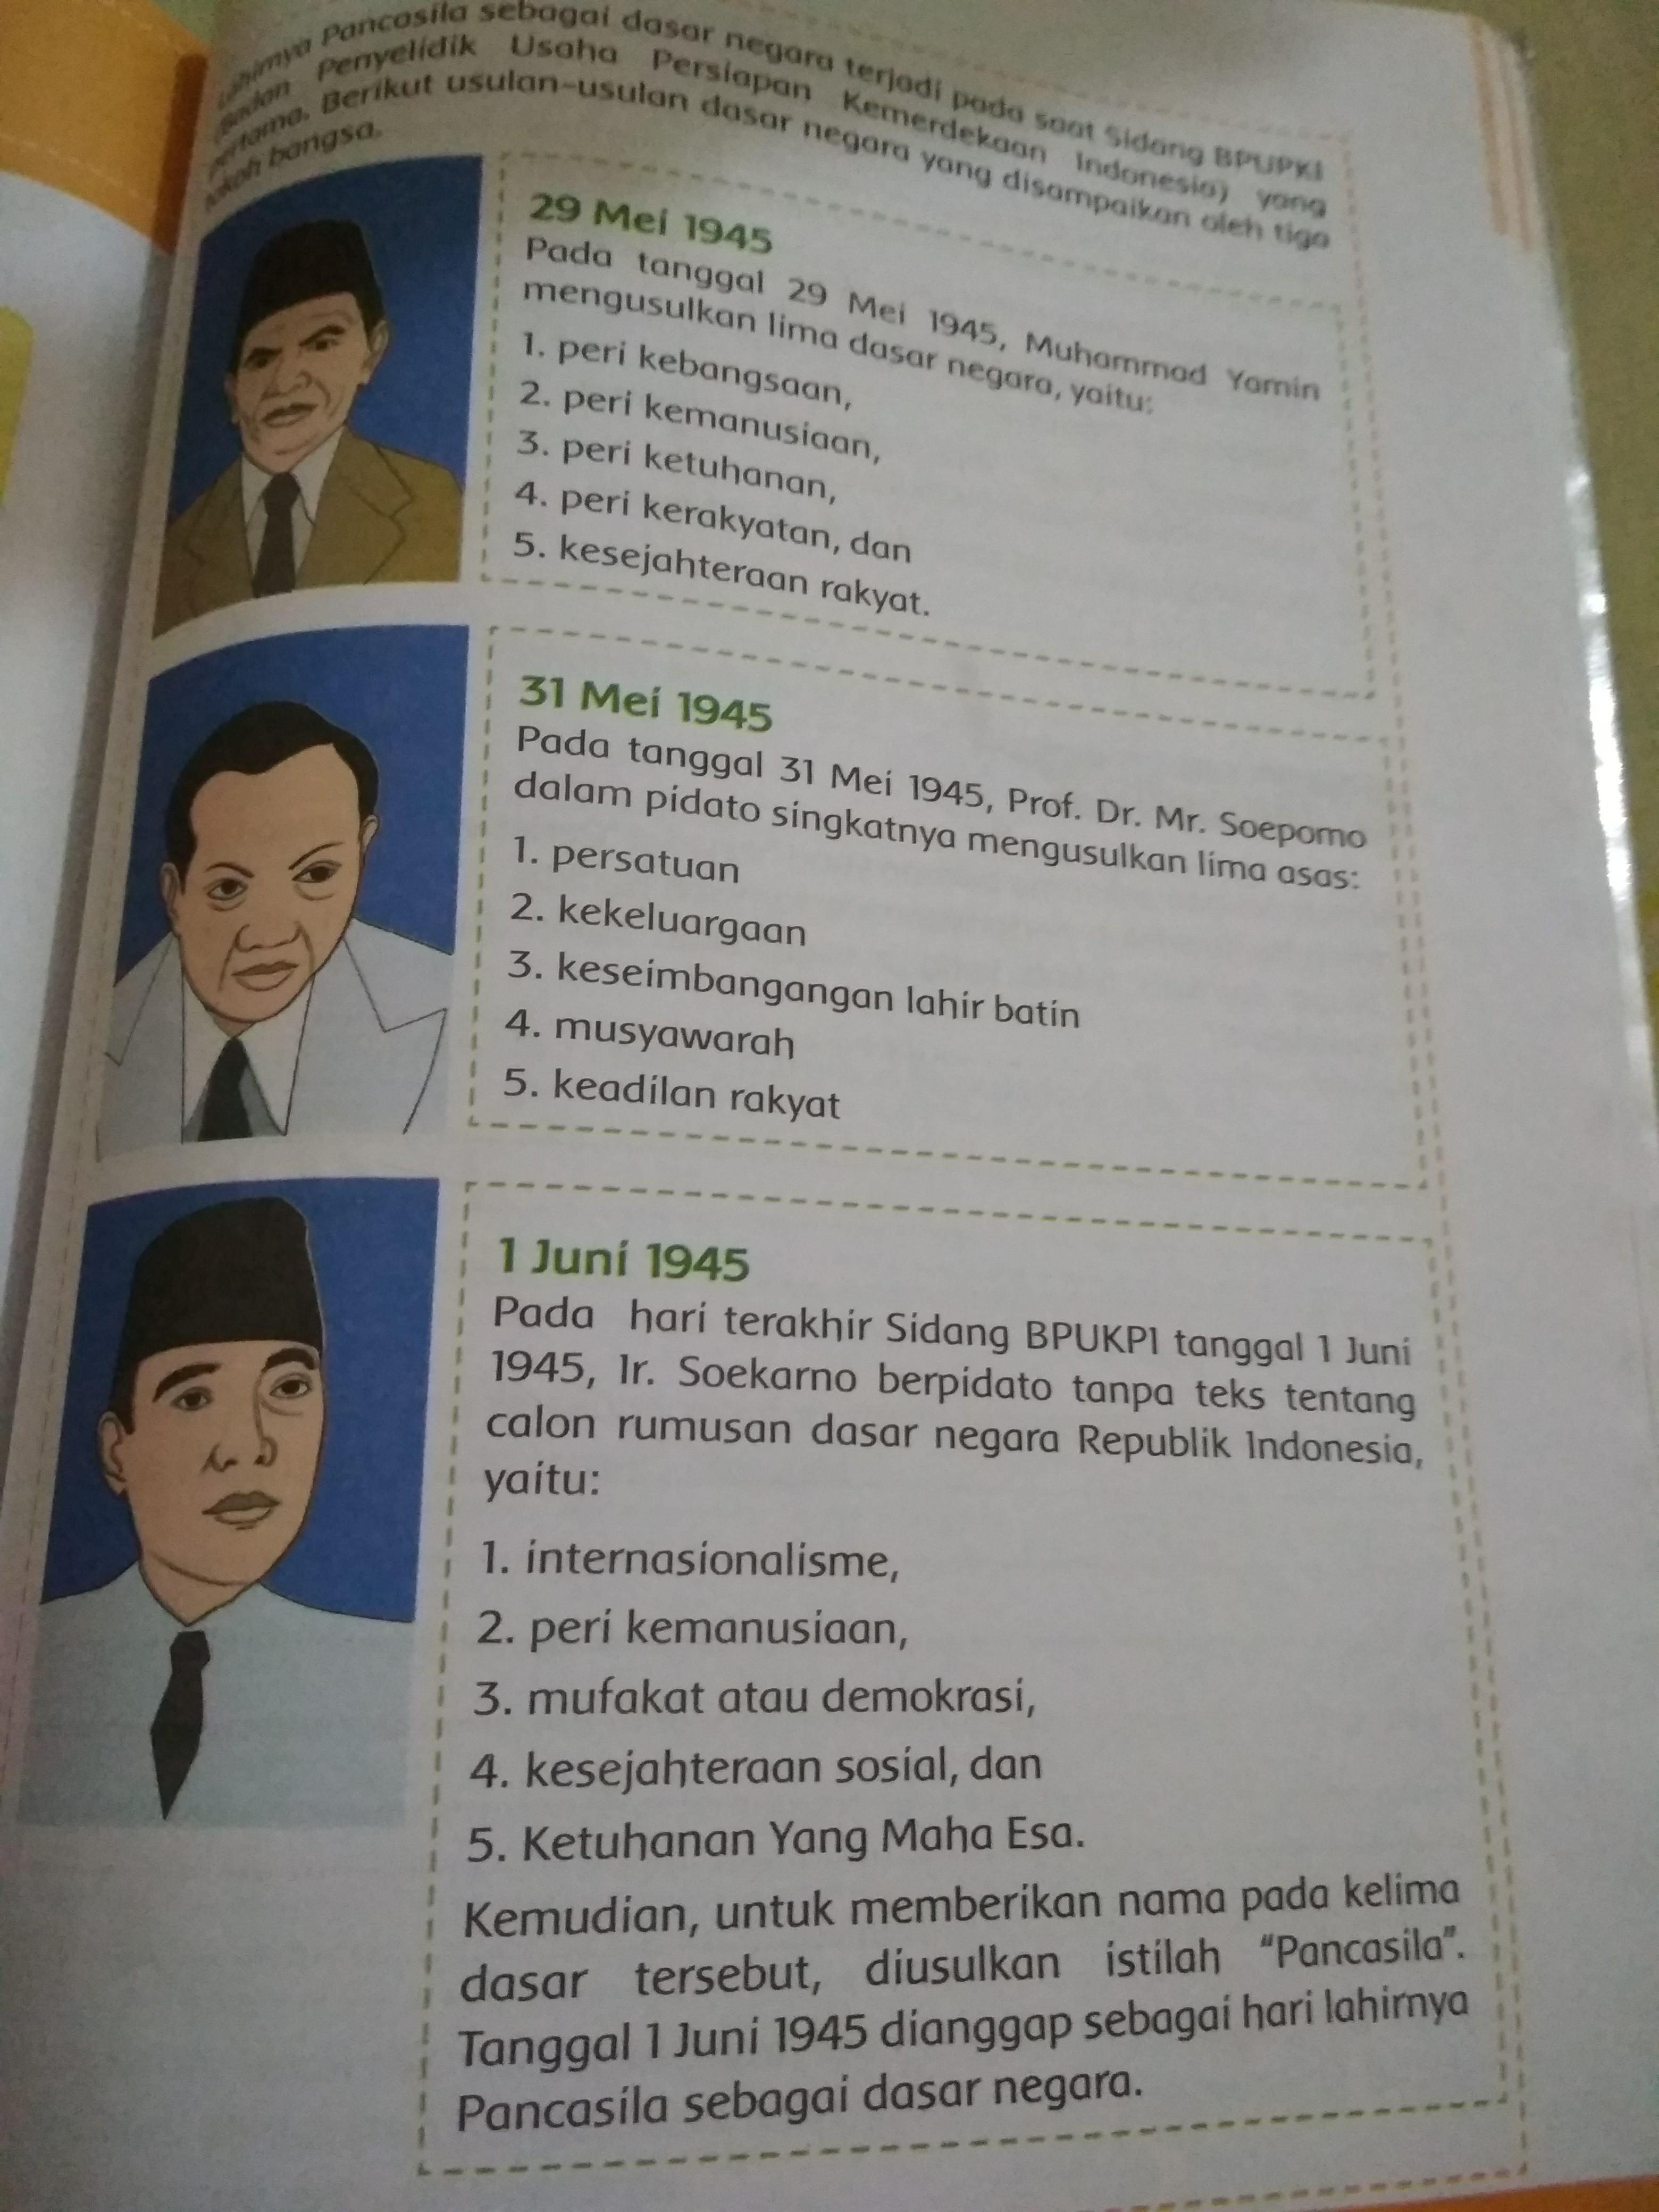 Usulan Dasar Negara Menurut Ir Soekarno : usulan, dasar, negara, menurut, soekarno, Siapakah, Tokoh, Mengusulkan, Rumusan, Dasar, Negara, Pertama, Brainly.co.id